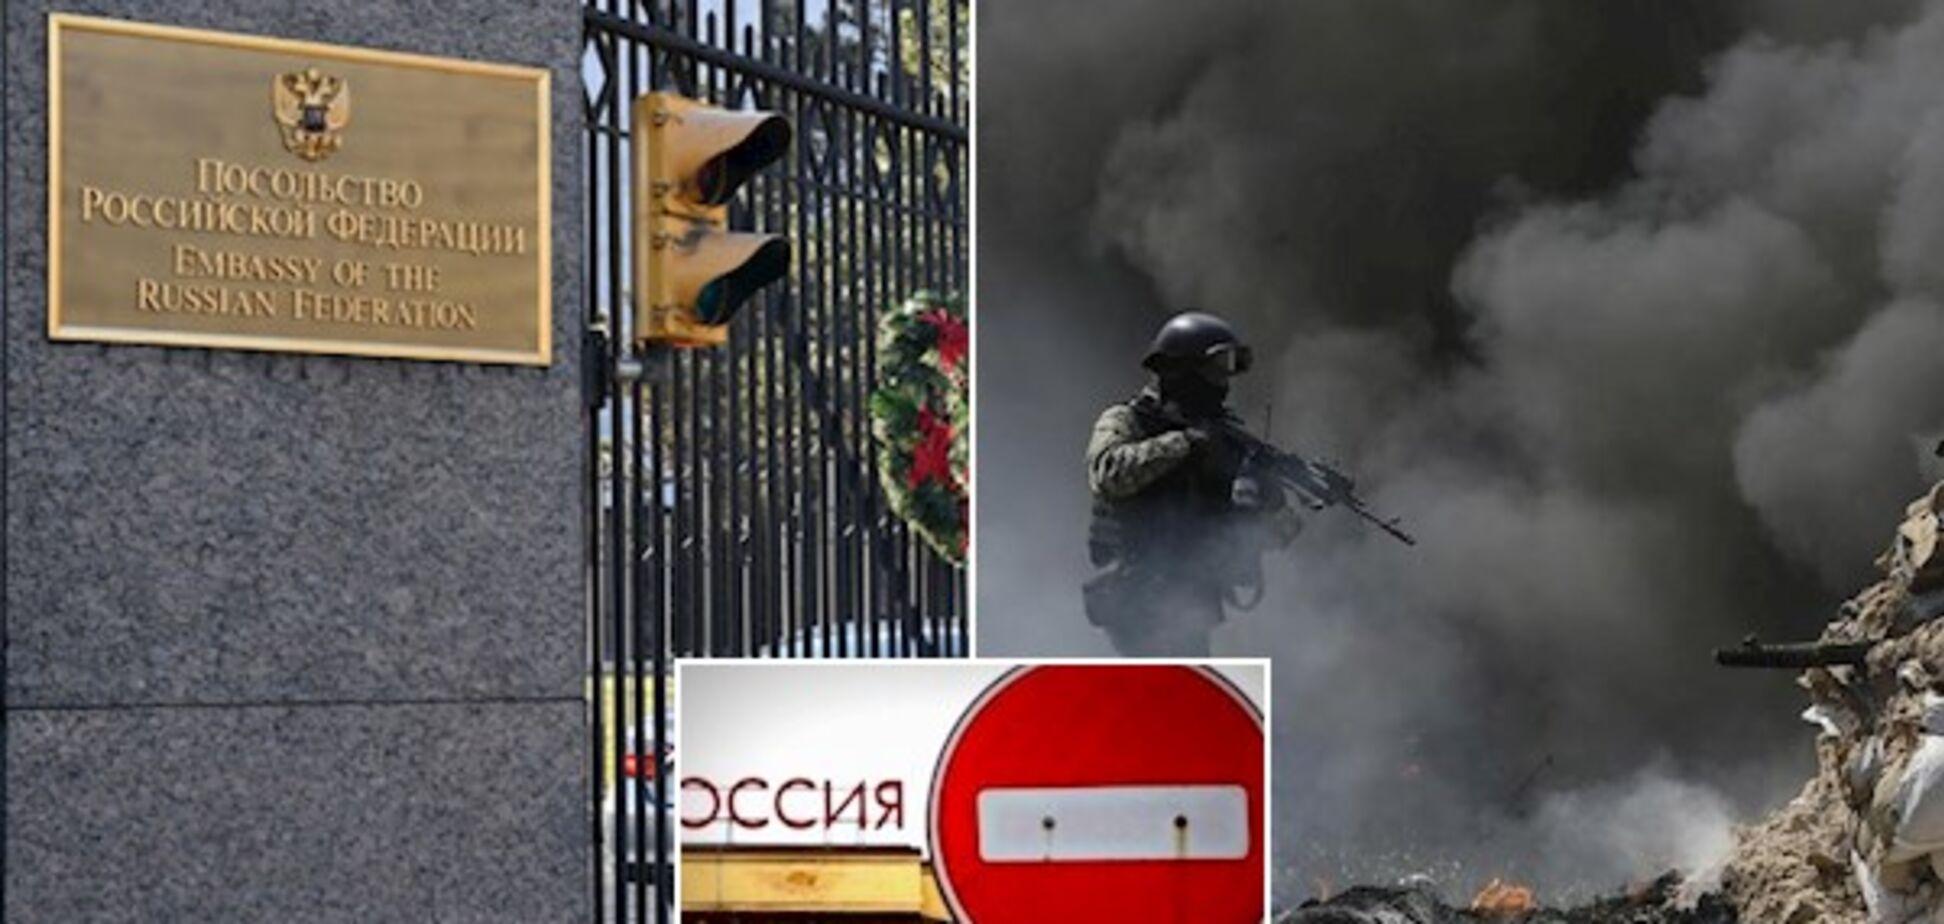 'Так треба боротися за своїх!' Україна ткнули носом в серйозну проблему